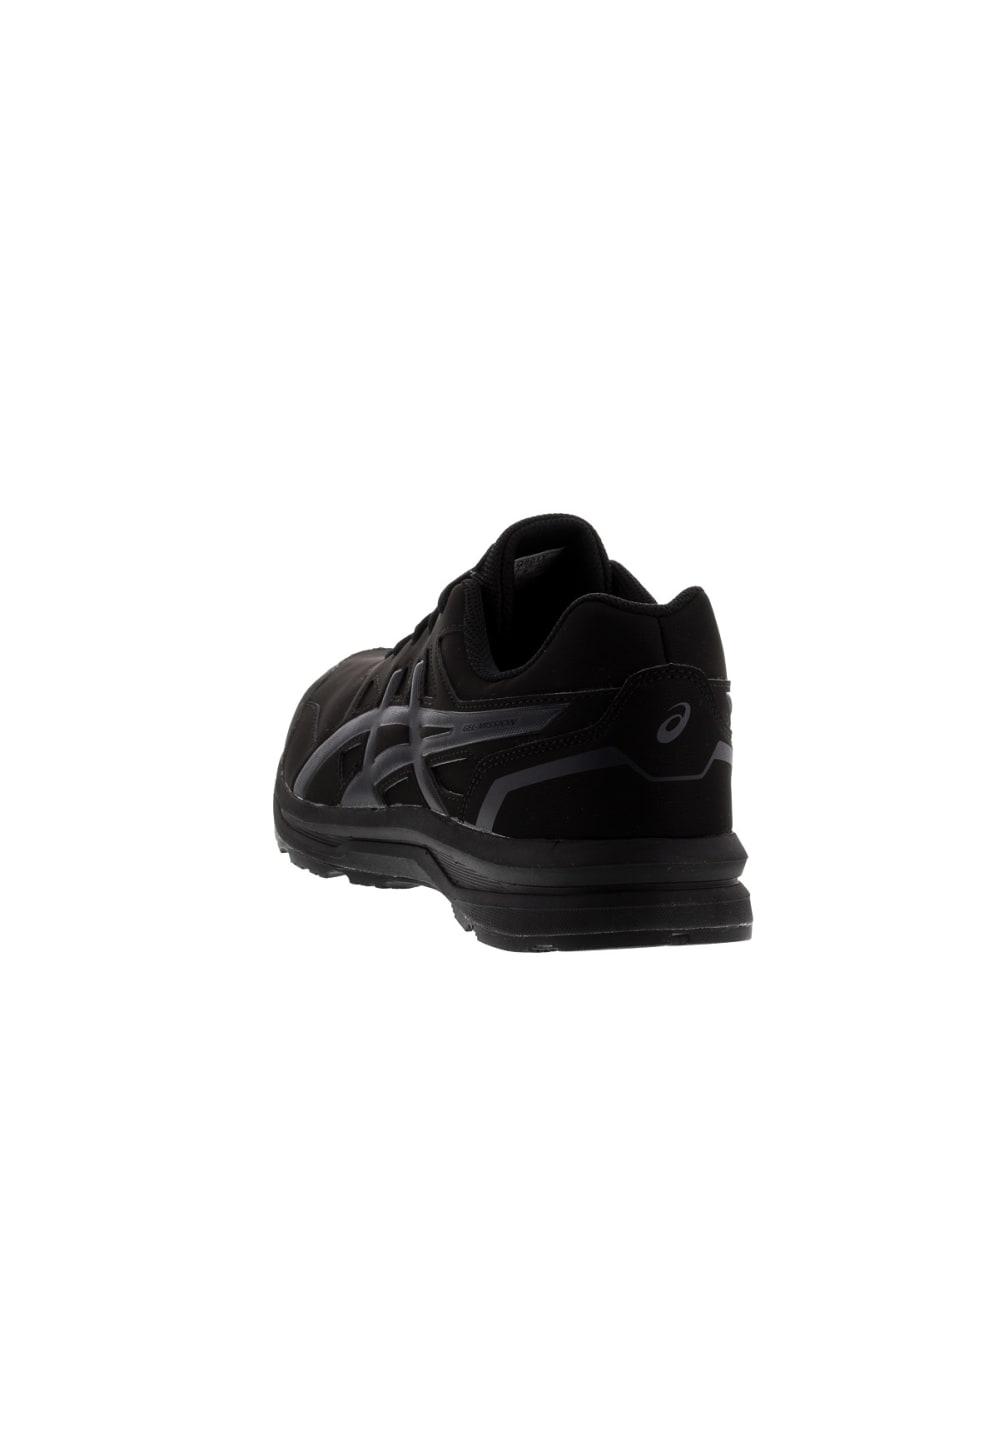 Mission Gel Asics Chaussures Running Pour Noir 3 Homme deCxBo